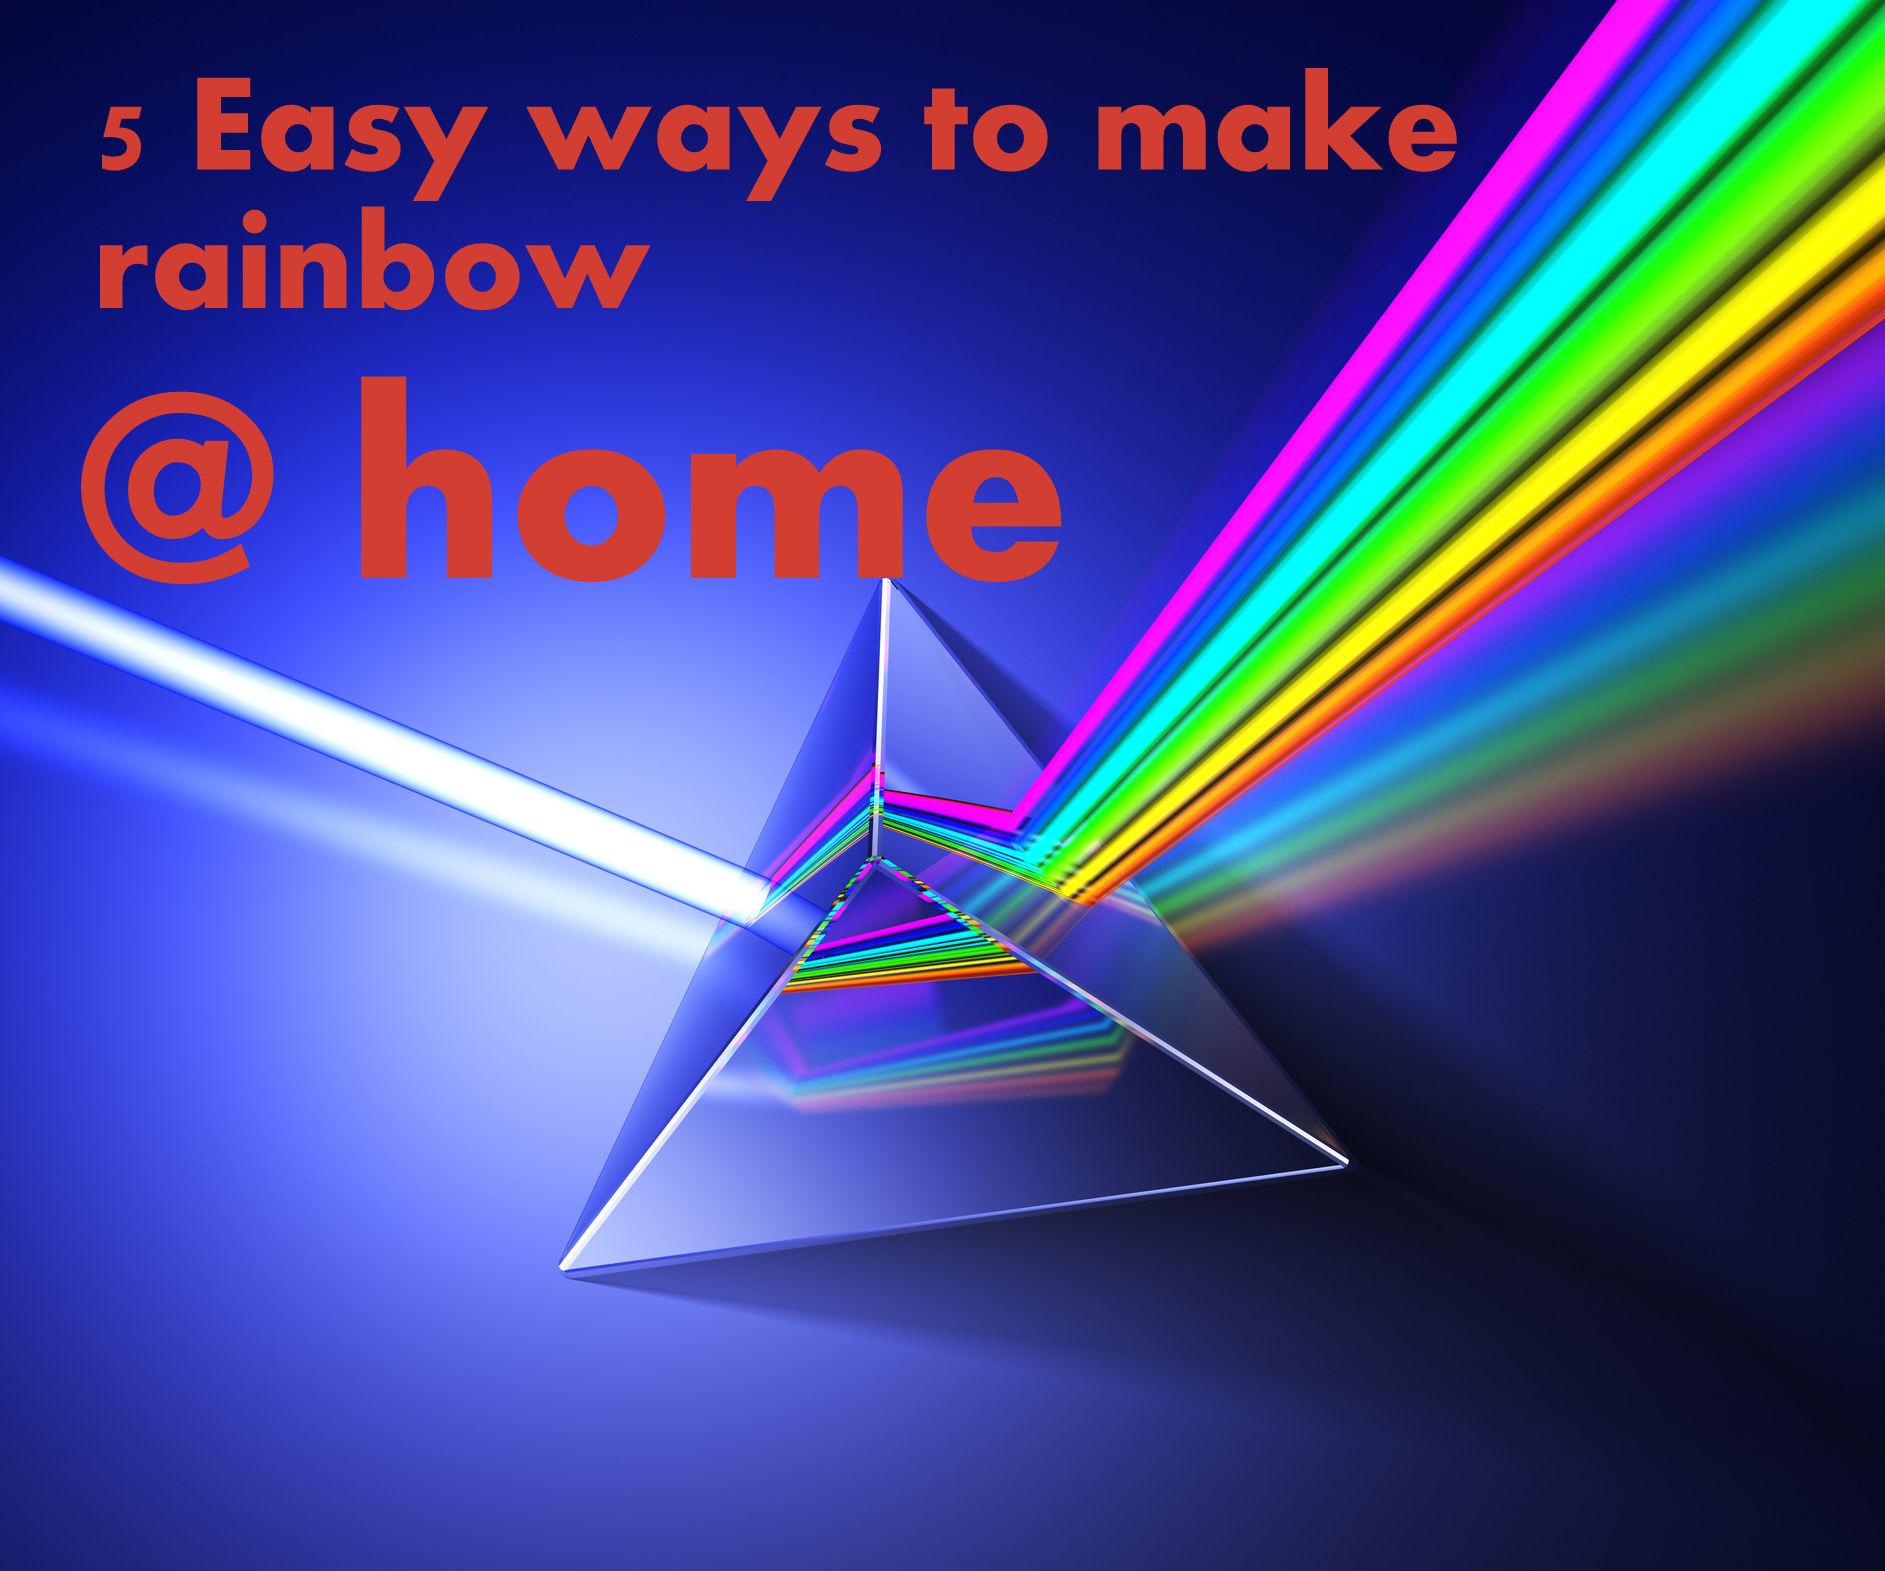 DIY How to Make Rainbows at Home?